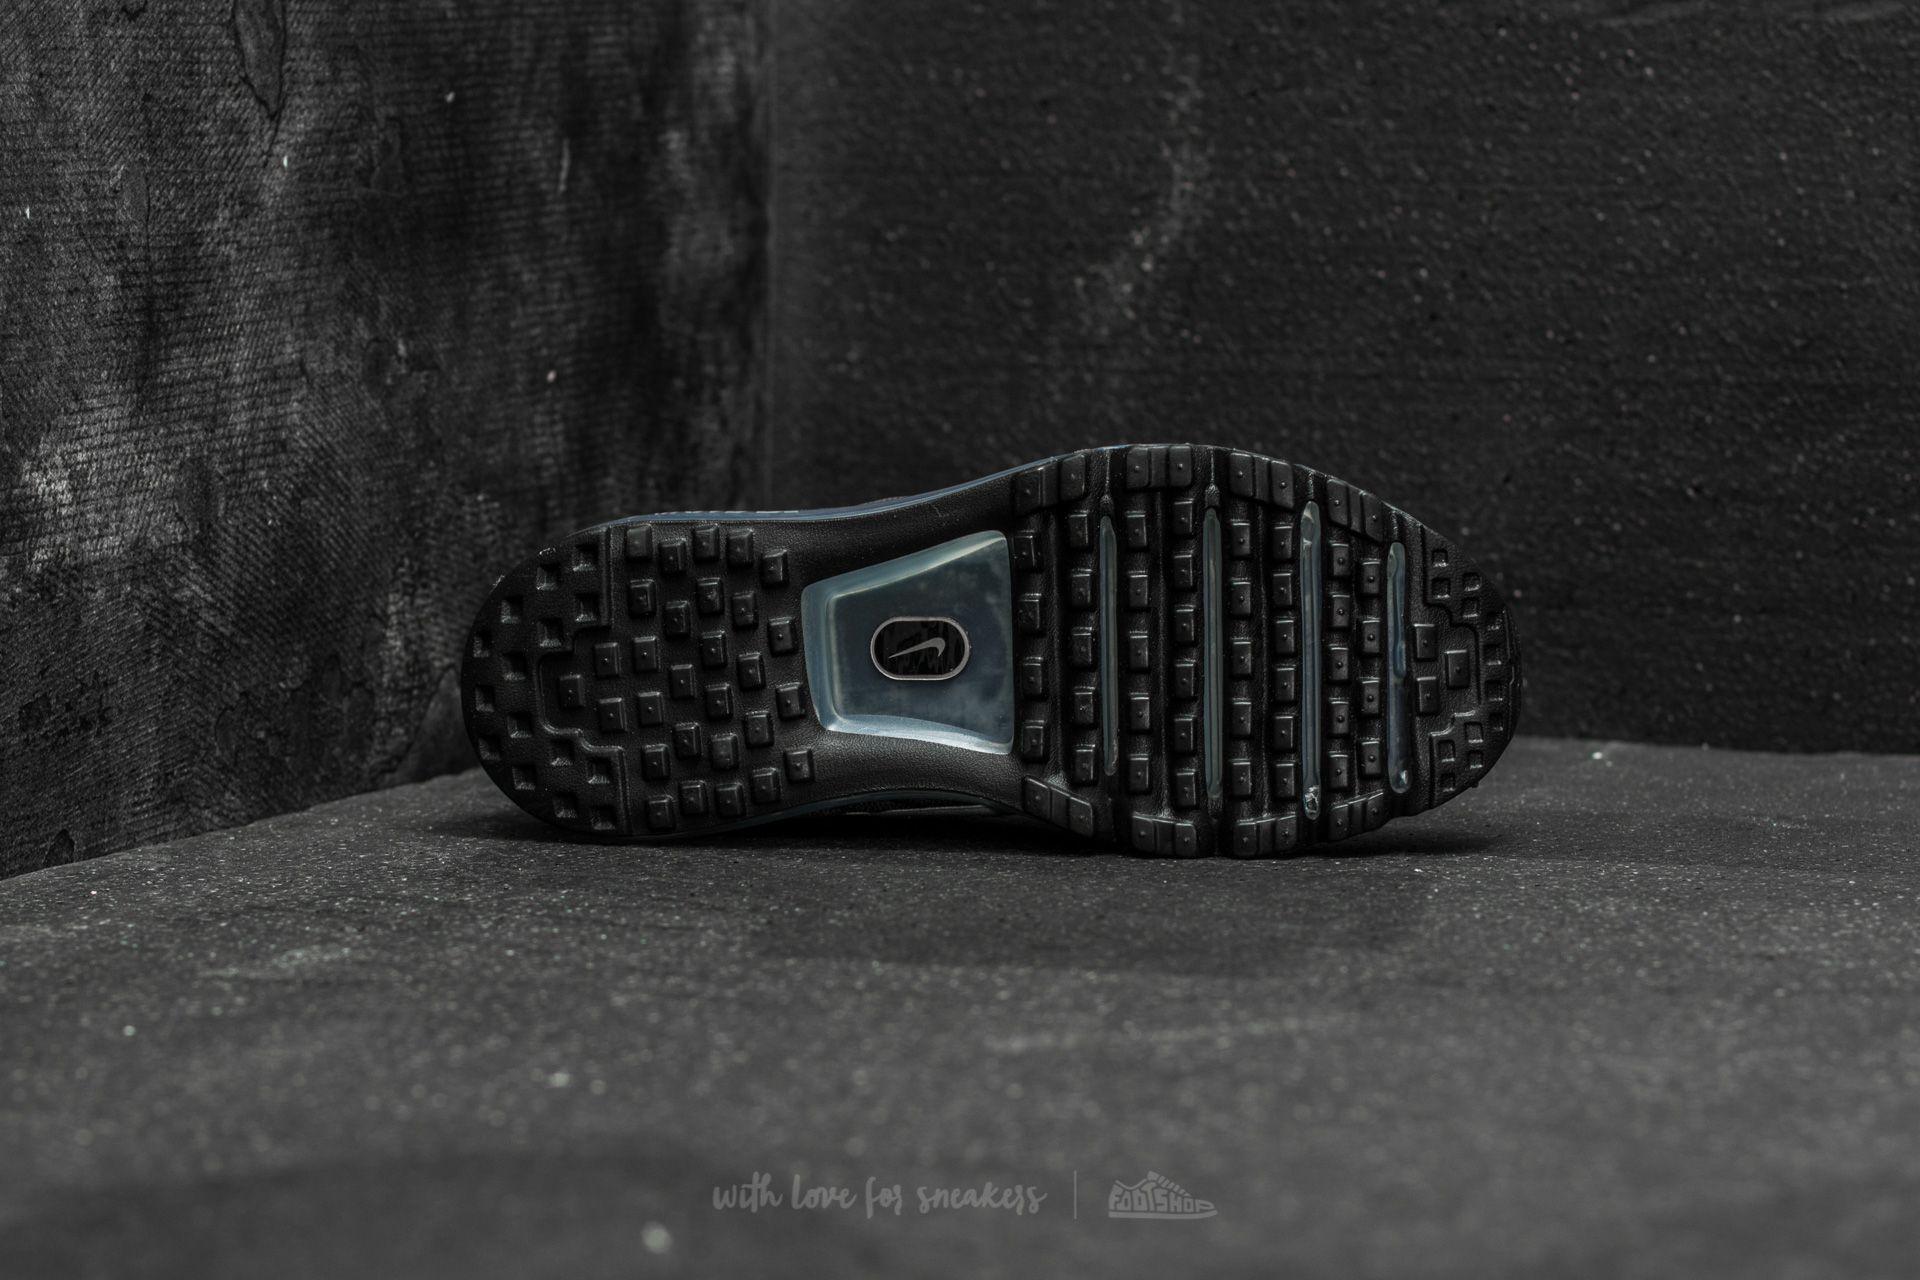 Nike Air Max 2017 (GS) Black Summit White Anthracite | Footshop